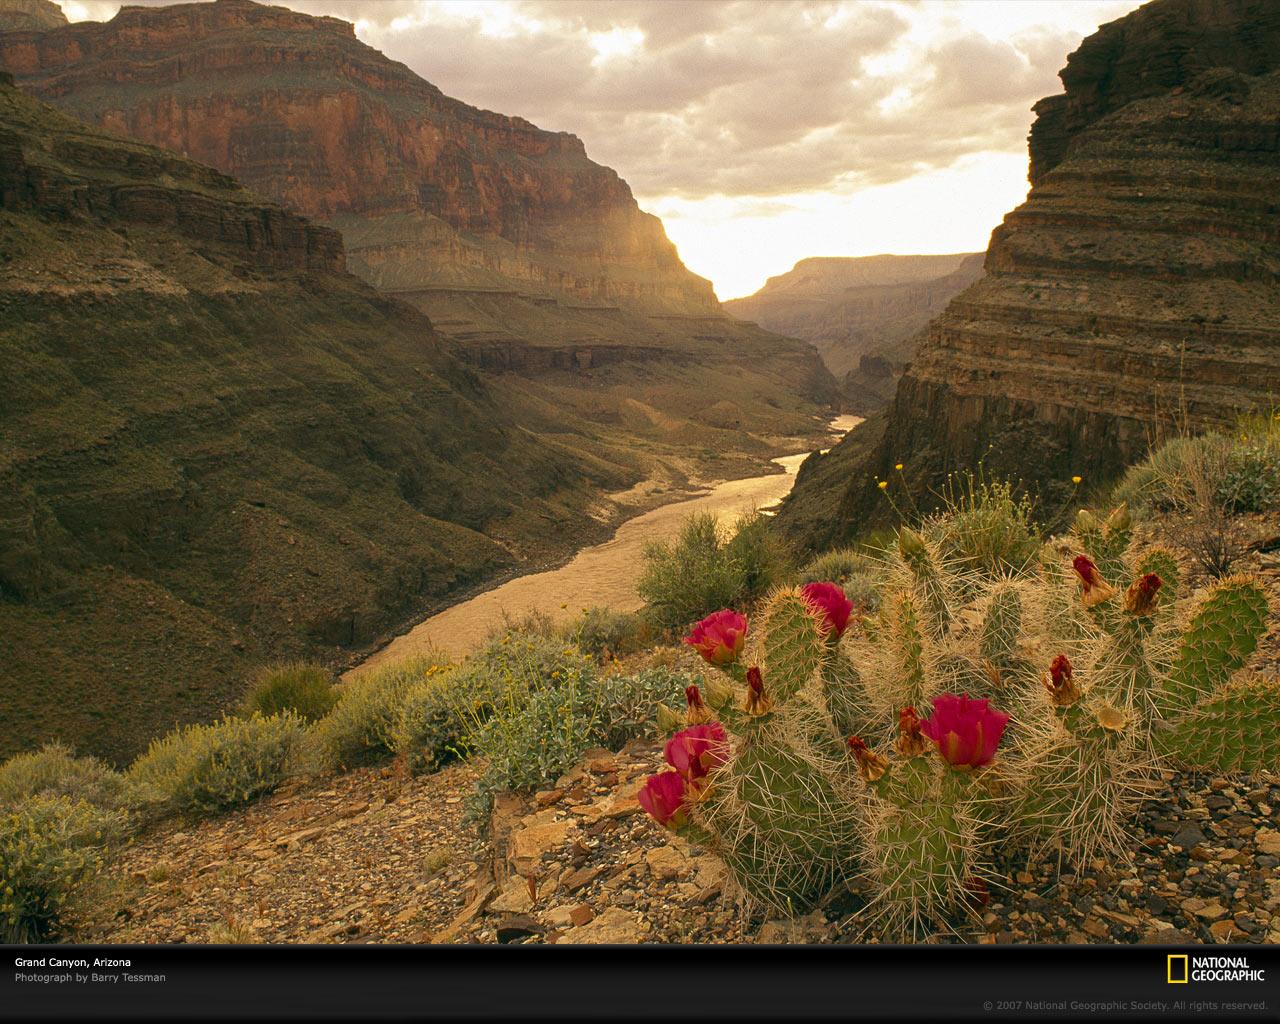 Grand Canyon Picture Colorado River Wallpaper Download Photos 1280x1024